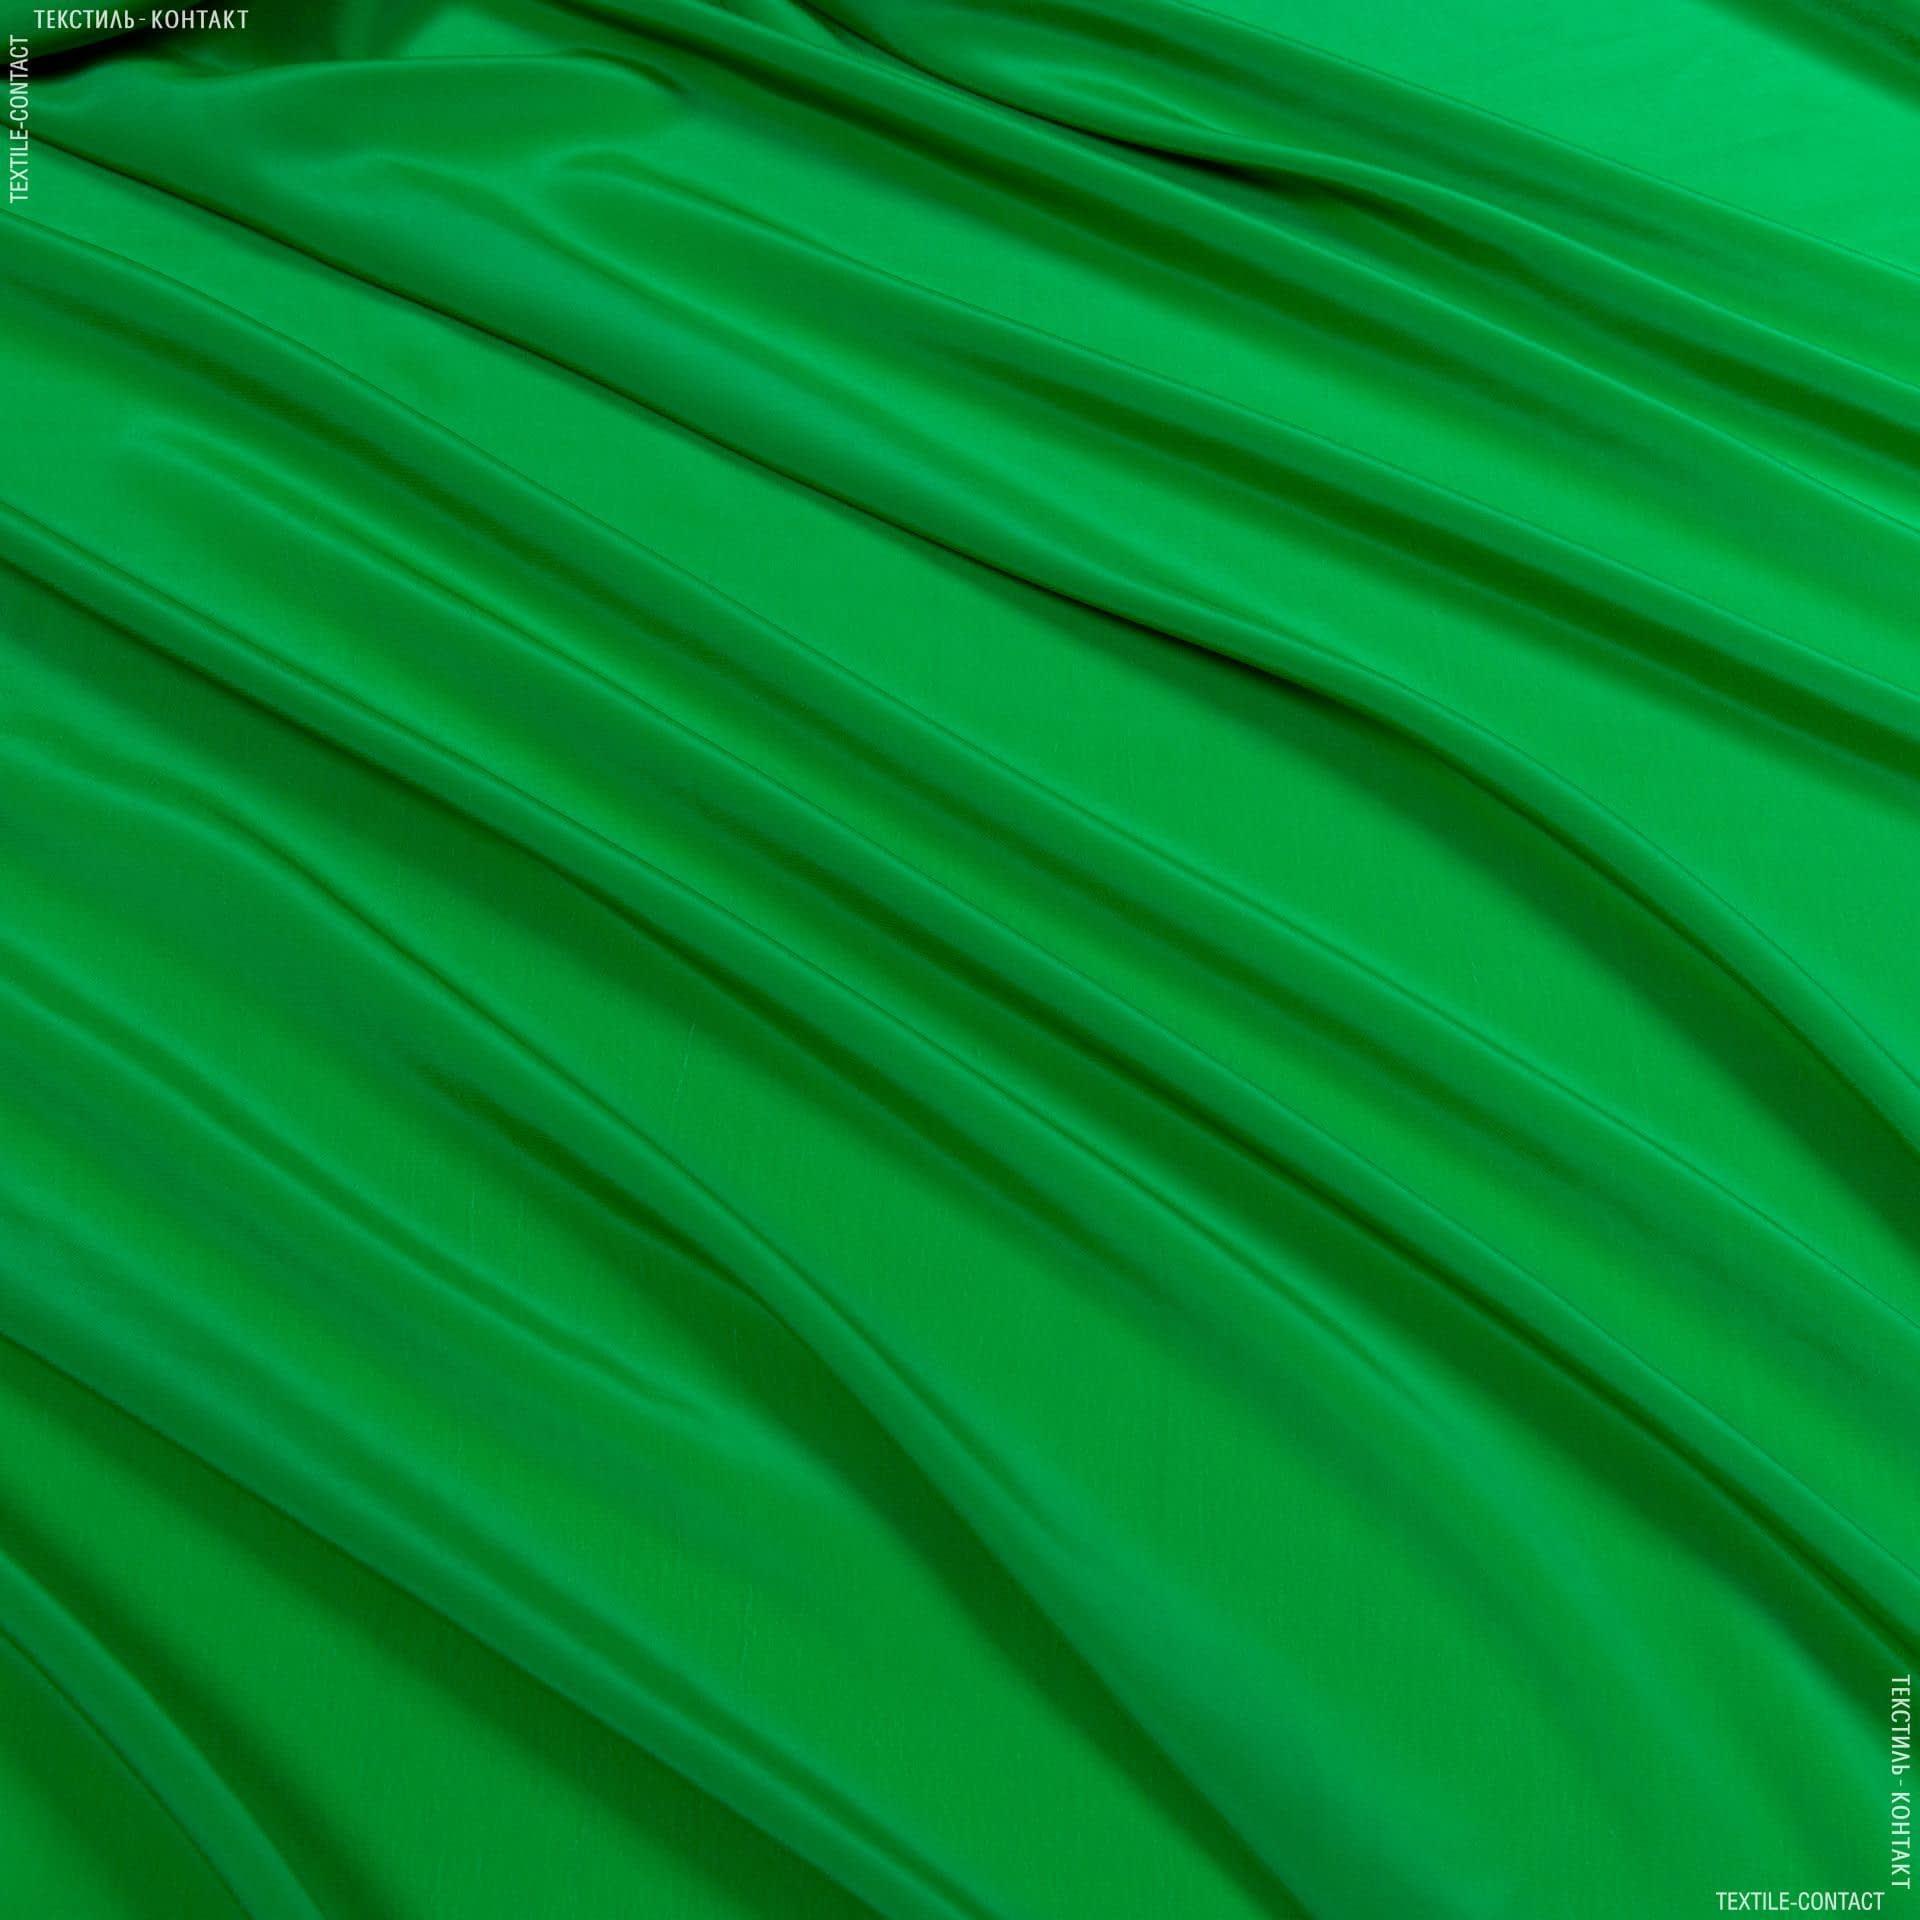 Ткани для платков и бандан - Креп кошибо трава